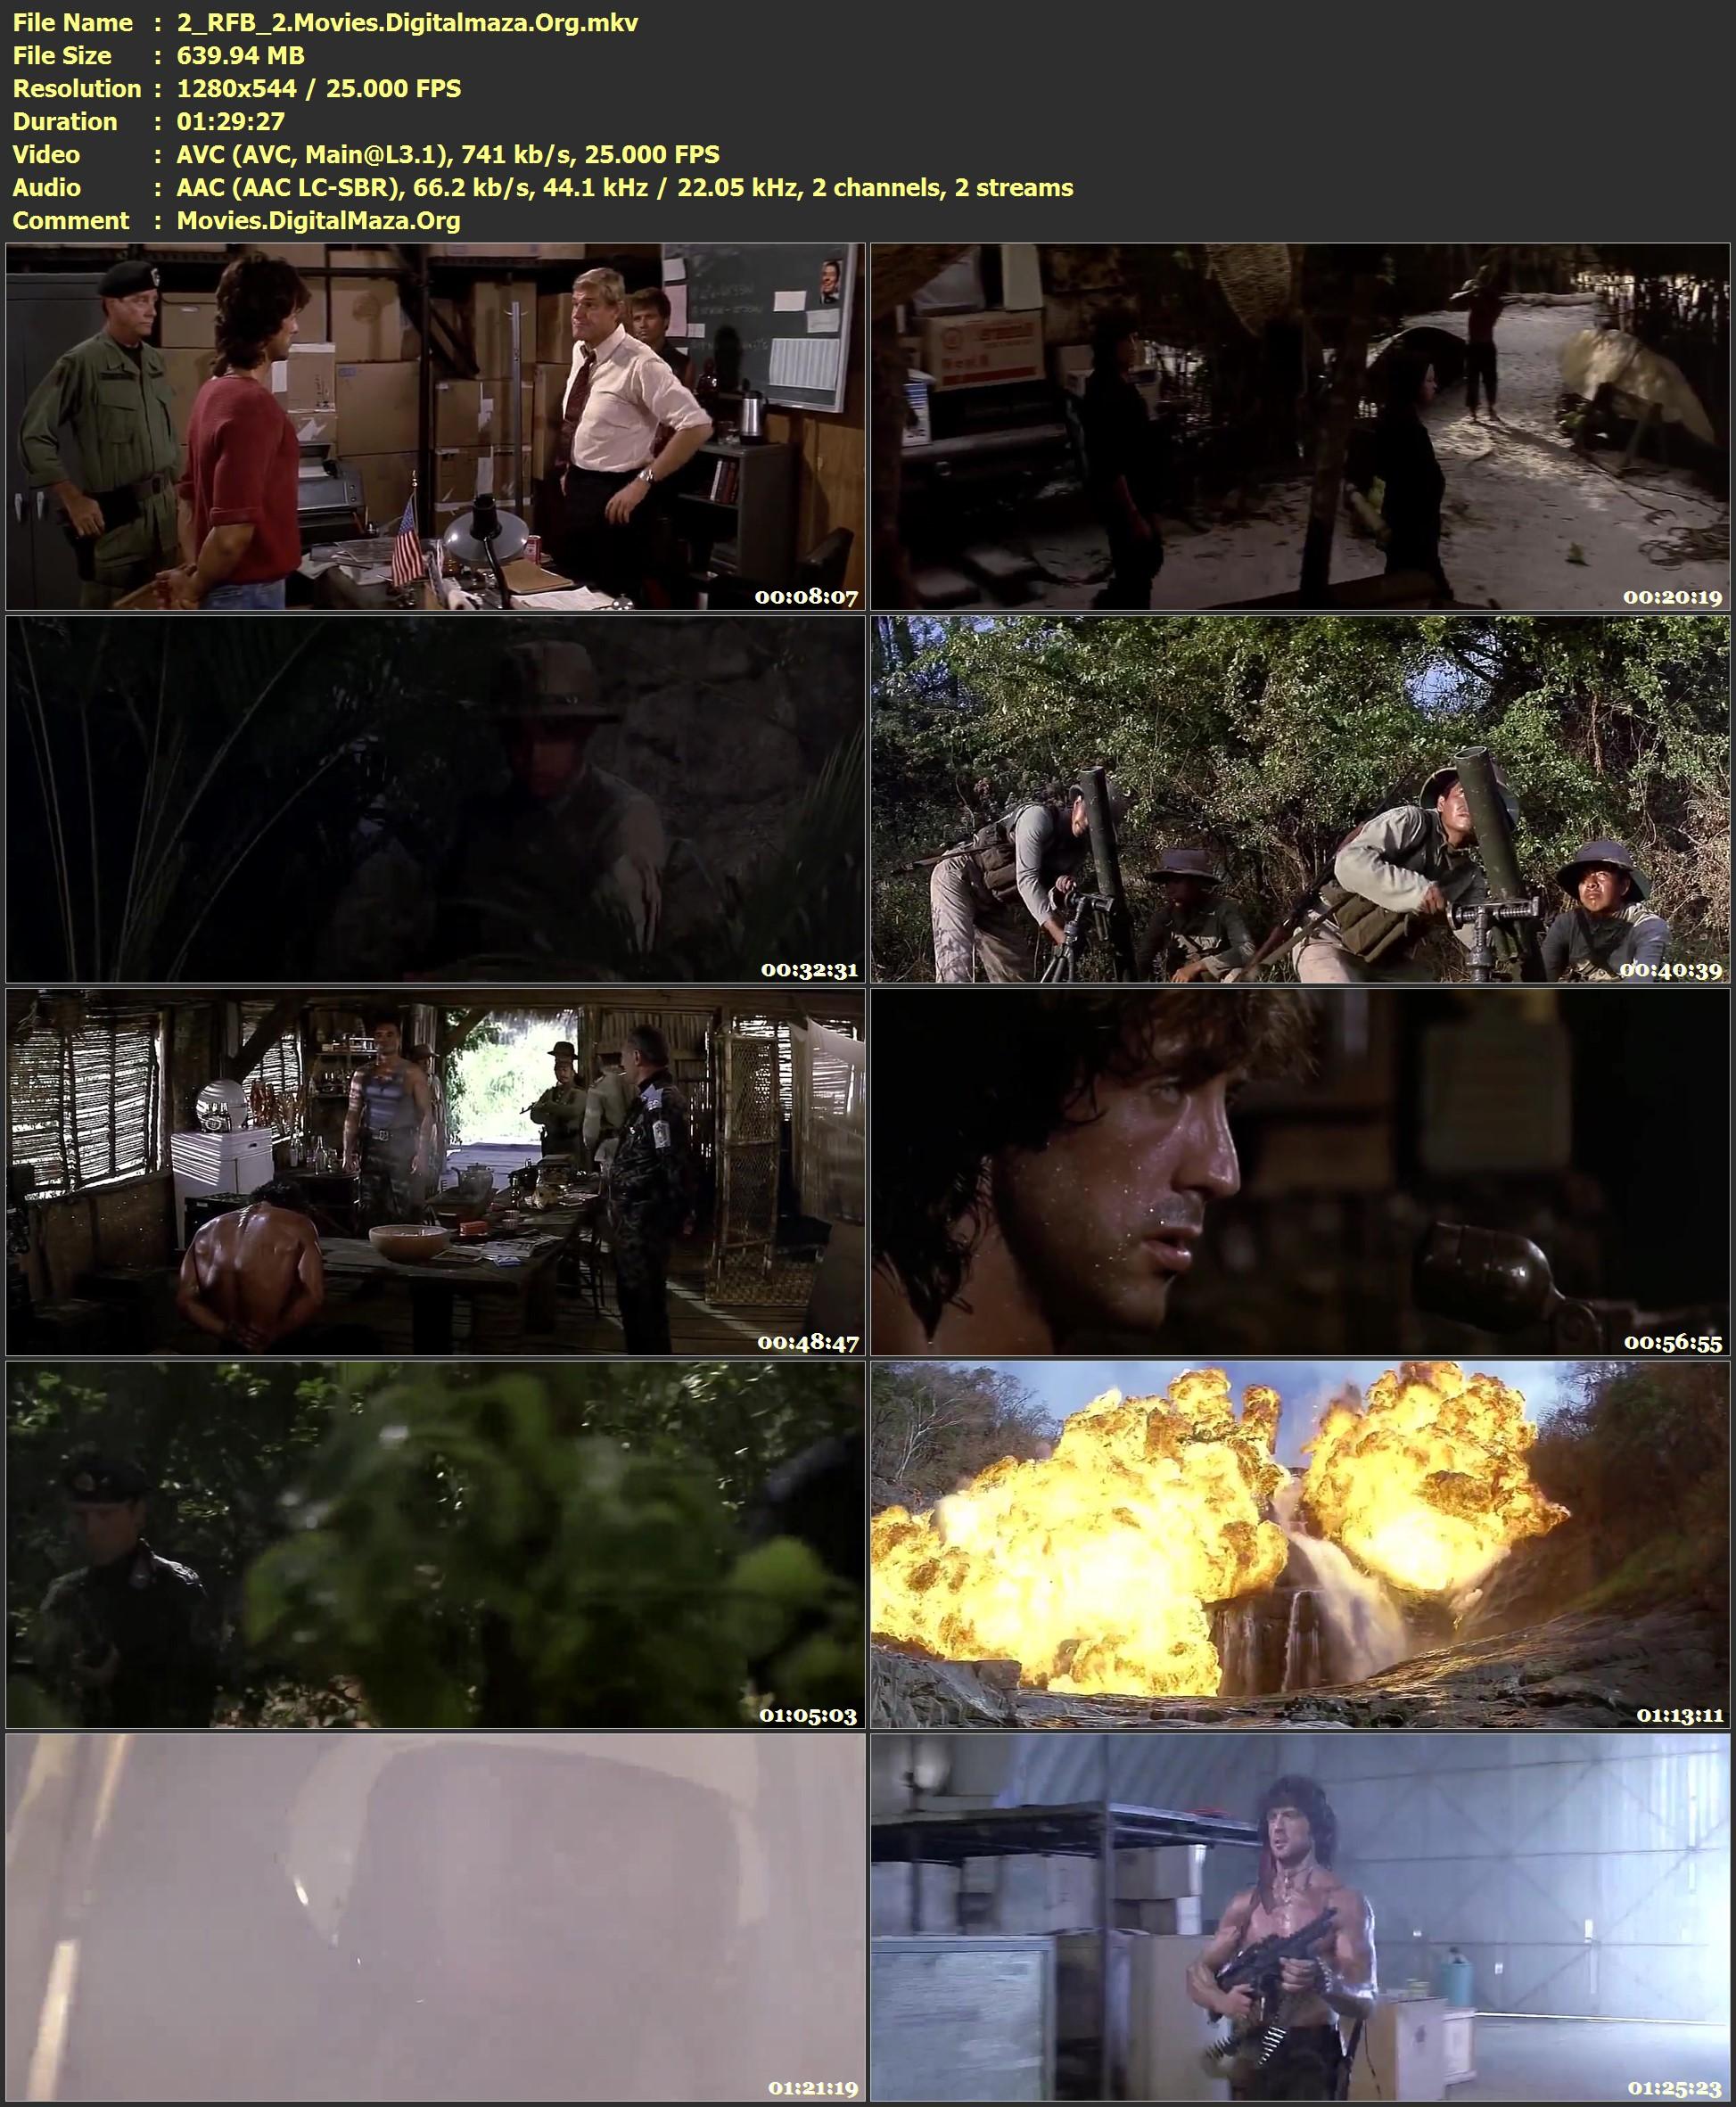 https://image.ibb.co/gSwZnc/2_RFB_2_Movies_Digitalmaza_Org_mkv.jpg